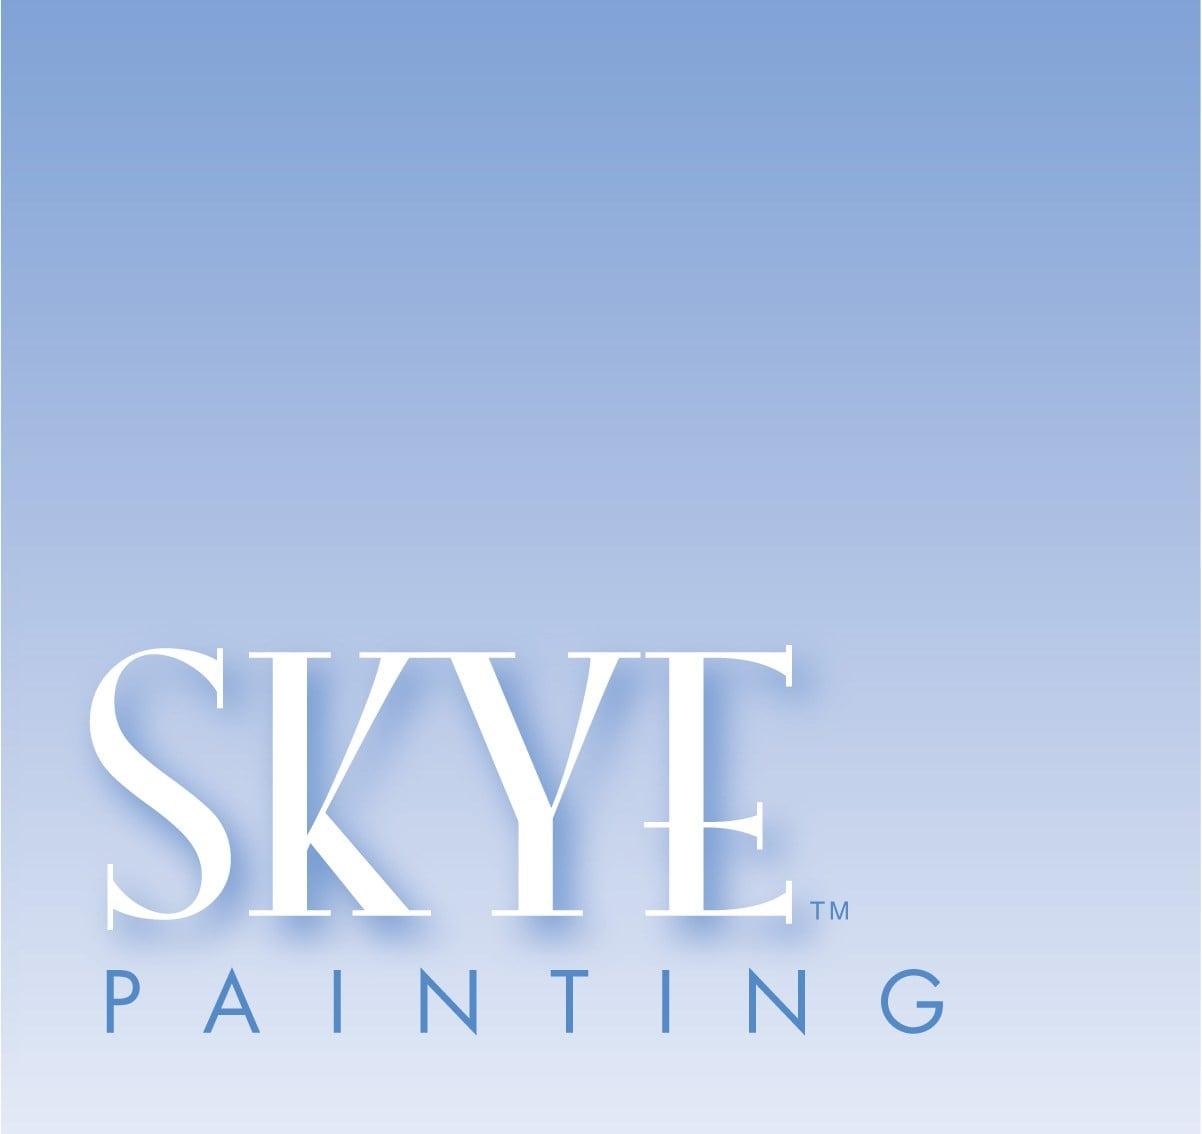 Skye Painting